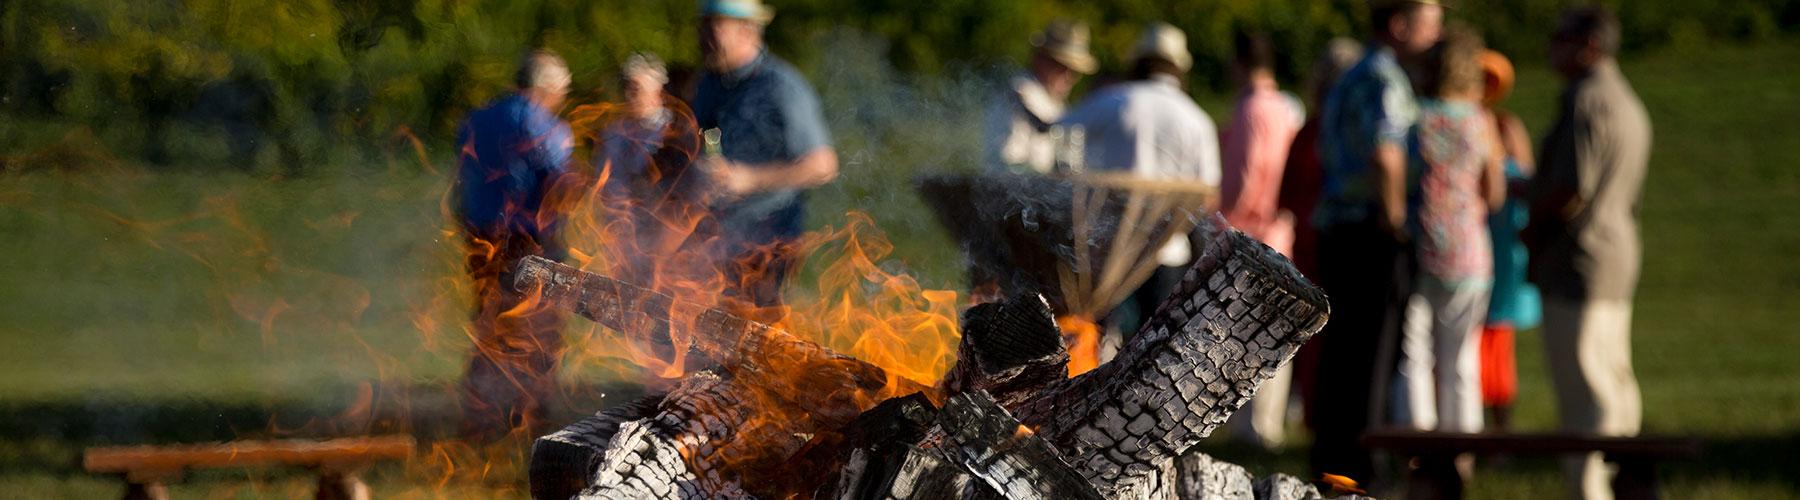 Meeting Folks around a Campfire